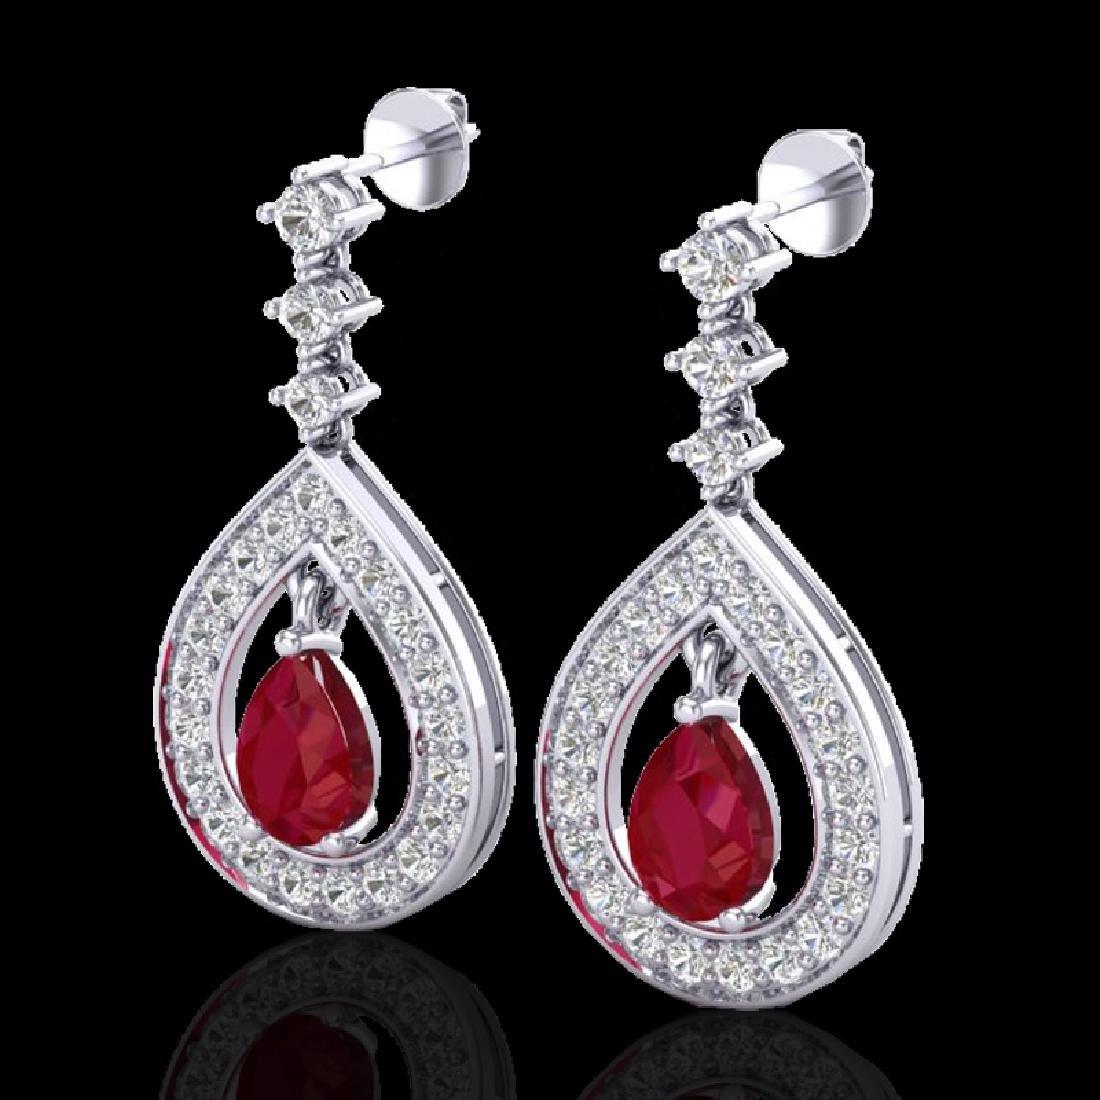 2.25 CTW Ruby & Micro Pave VS/SI Diamond Earrings